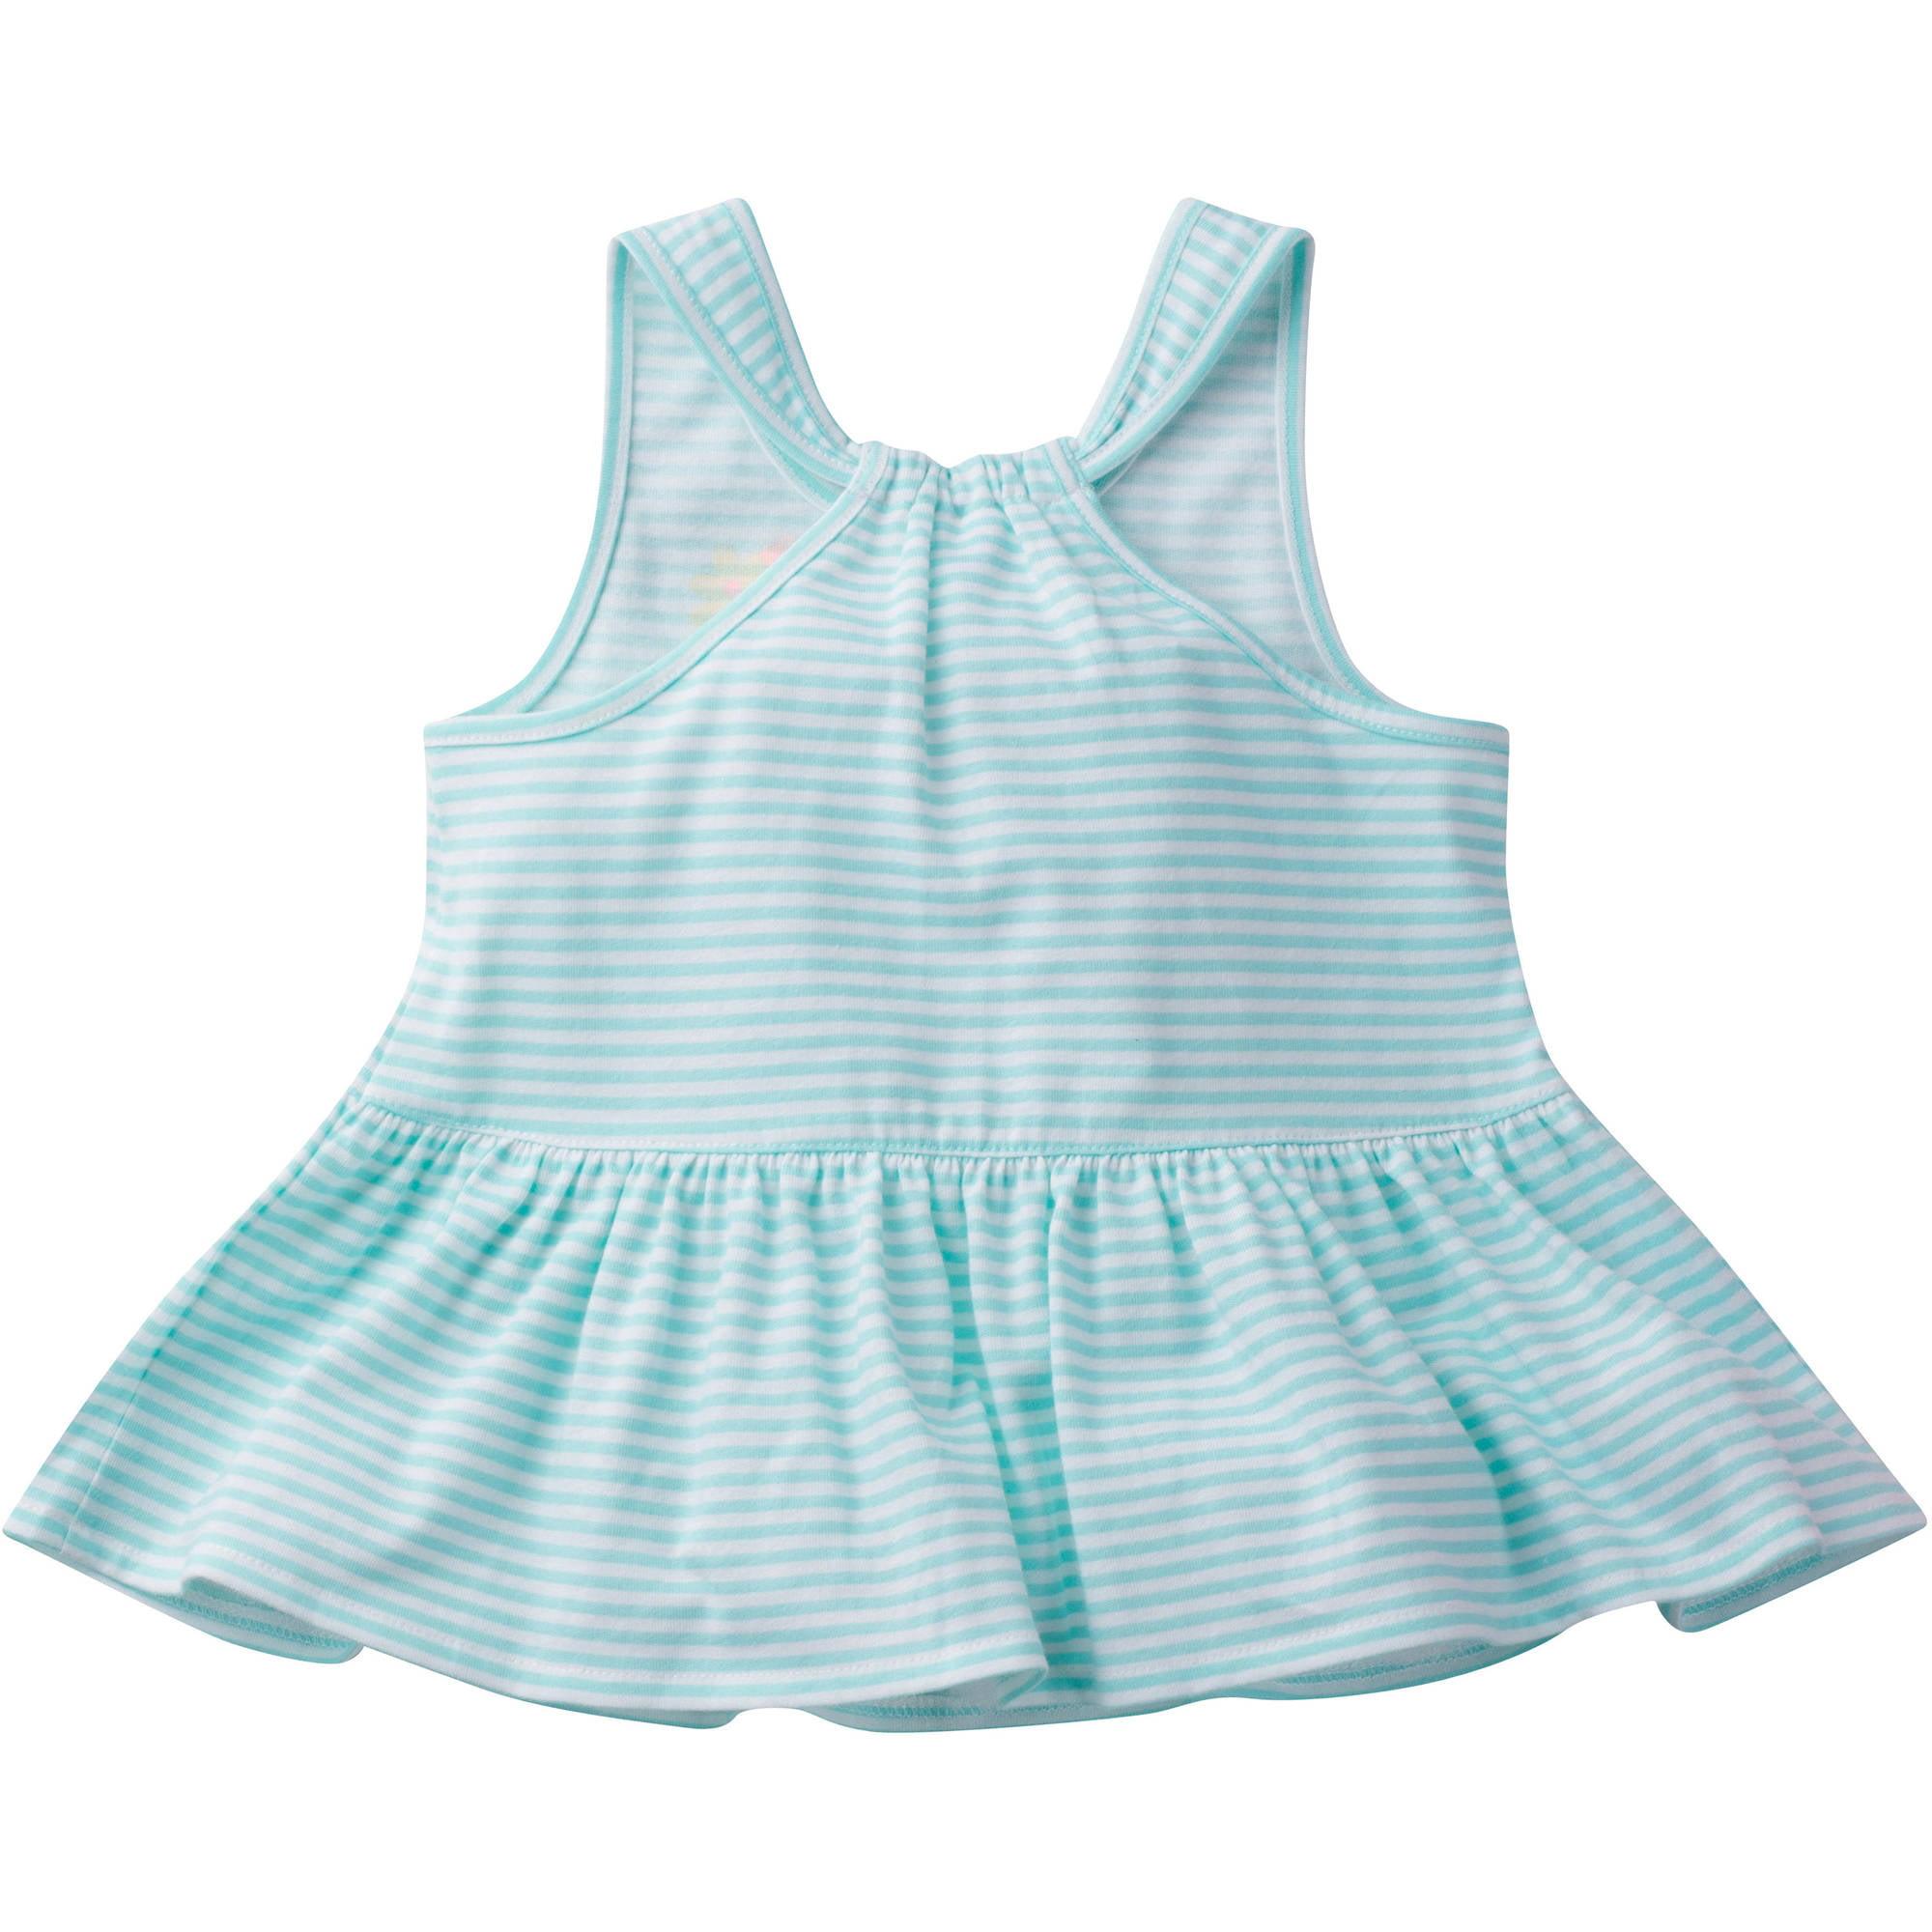 Graduates Baby Toddler Girl Sleeveless Tunic Shirt with Ruffle